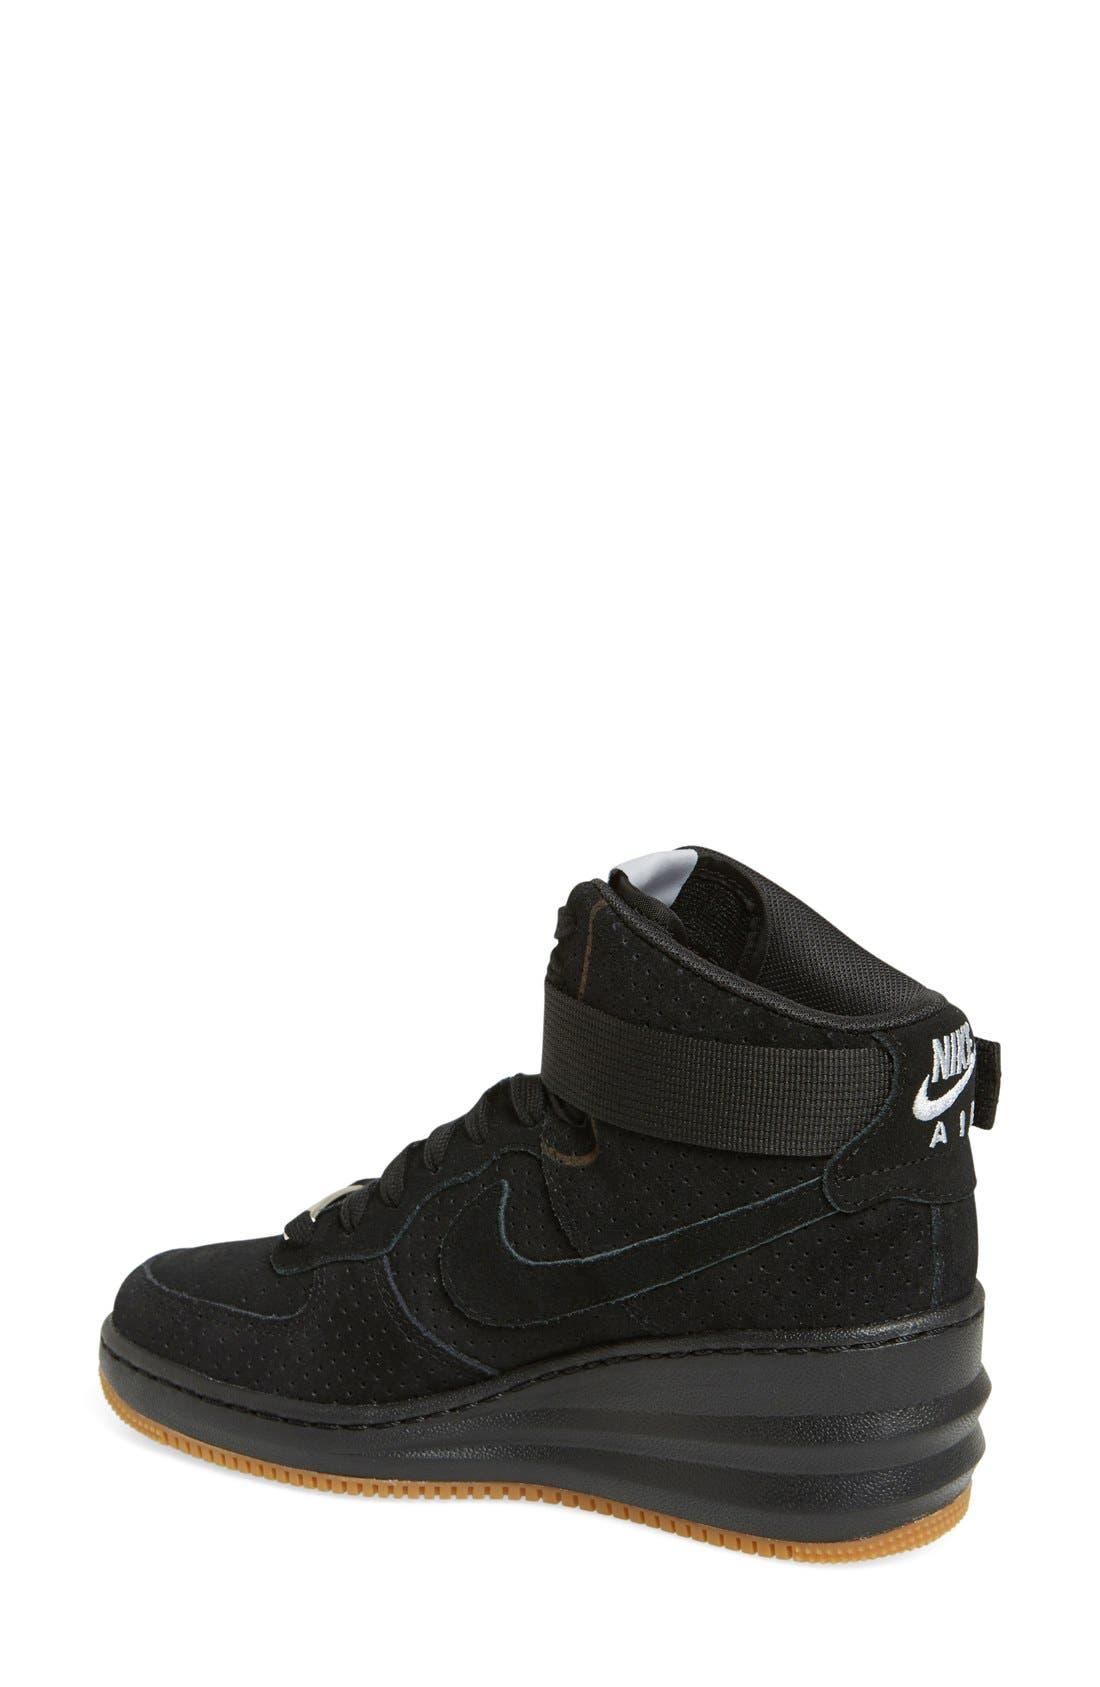 Alternate Image 3  - Nike 'Lunar Force Sky Hi' Wedge Sneaker (Women)